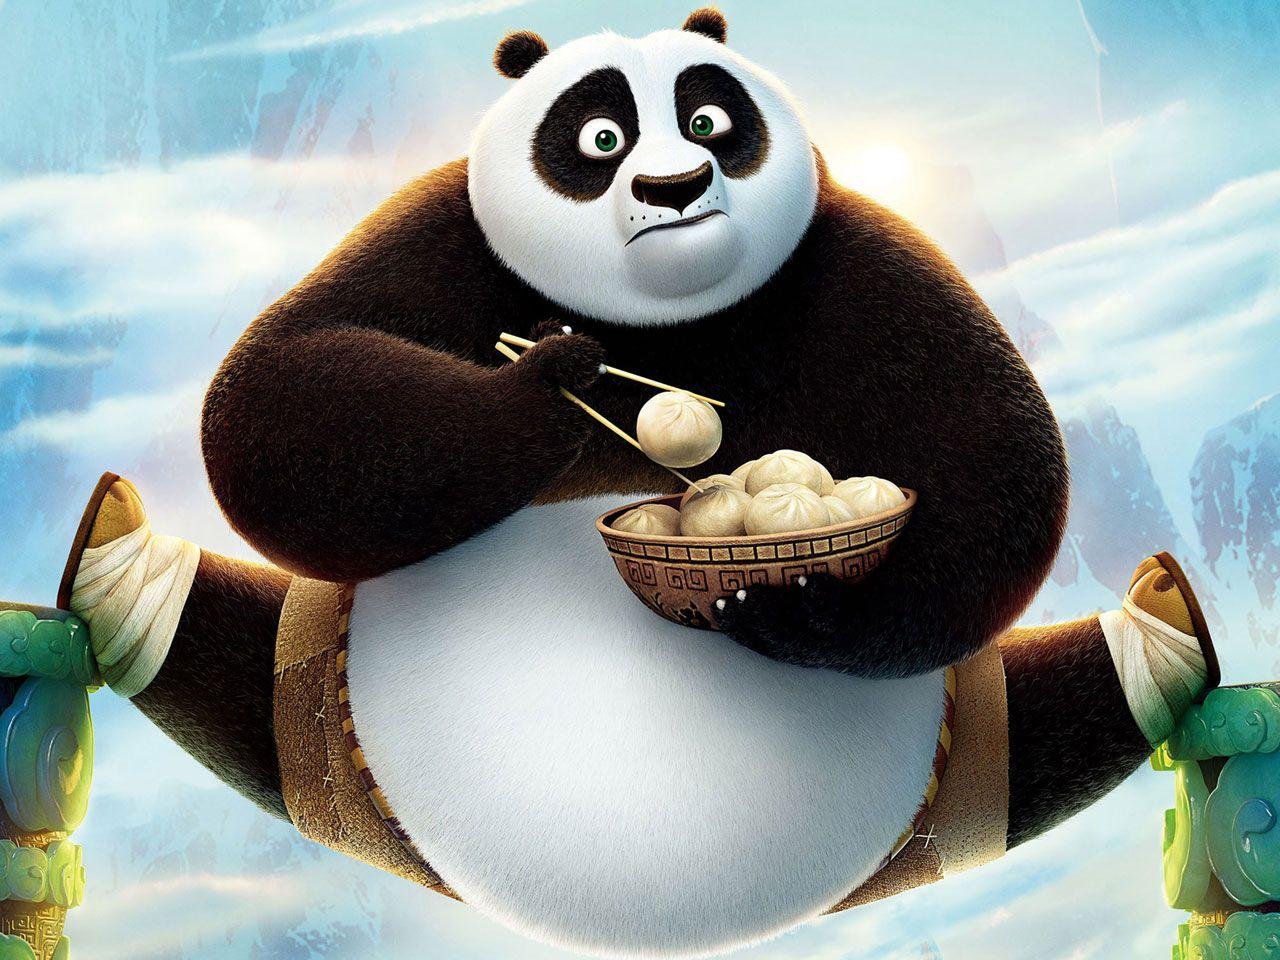 Kung Fu Panda 3 Wisdom Of Oogway Amazing Life Daily Kung Fu Panda 3 Kung Fu Panda Panda Movies